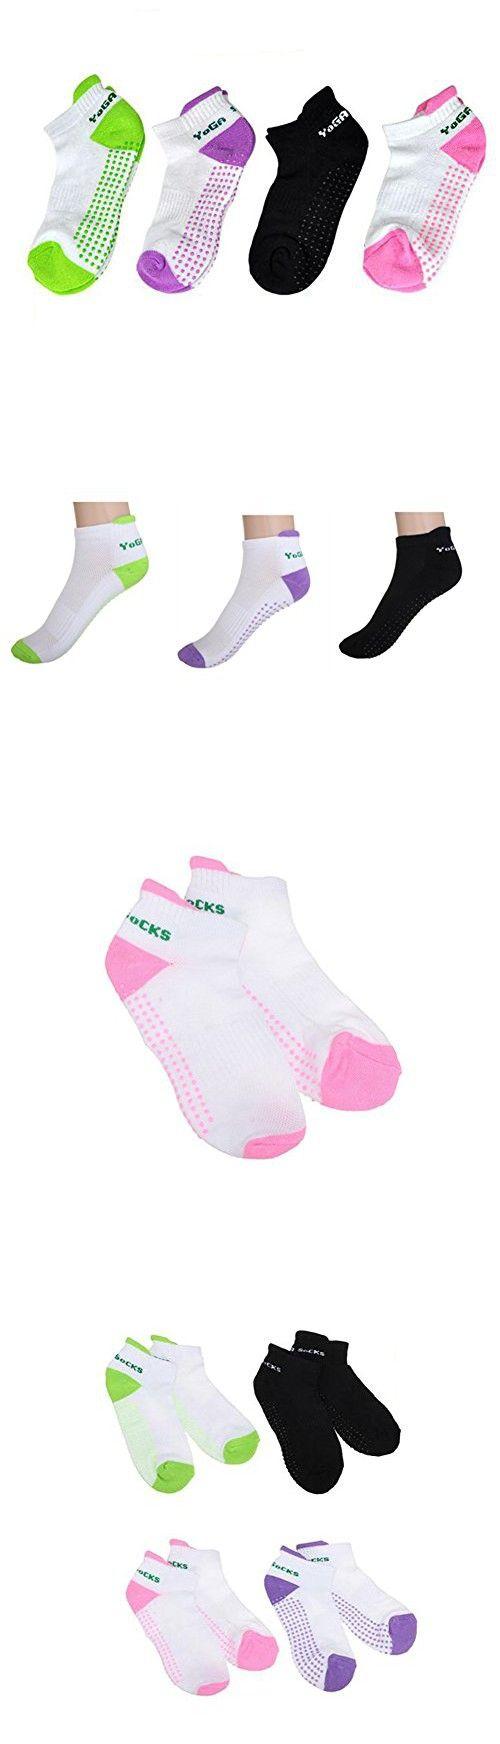 Women Girls 4Pcs Colorful Non Skid Anti Slip Grips Dots Yoga Pilates Socks Sports Gym Dance Exercise Foot Massage Socks